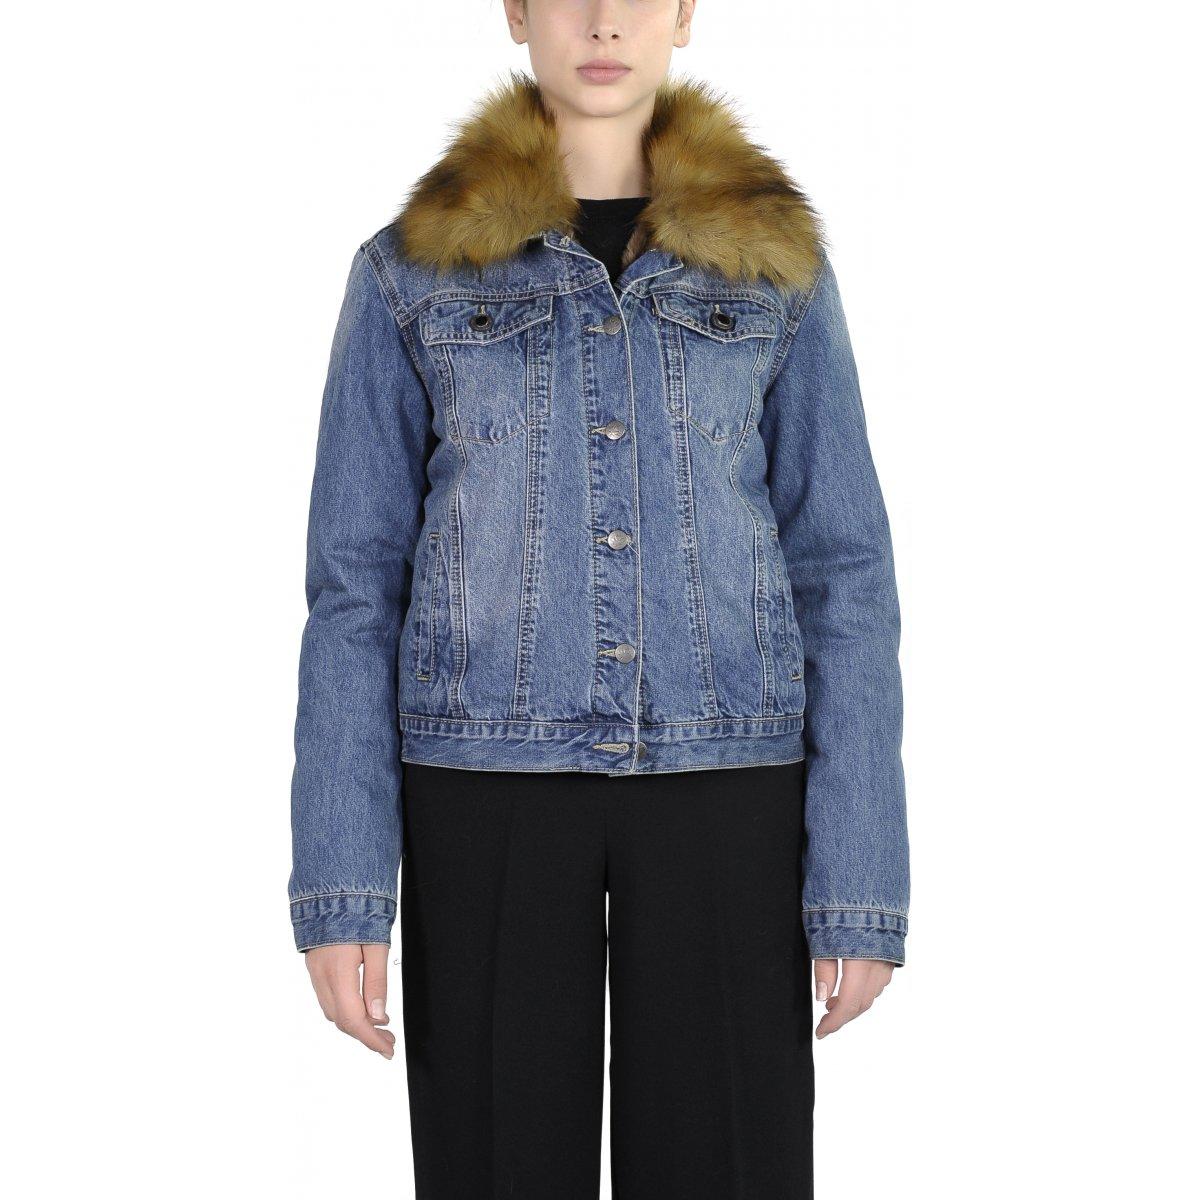 wholesale dealer 152b2 f6c2b Giacca Donna Shelburne Denim Ecopelliccia - denim Canadian Women